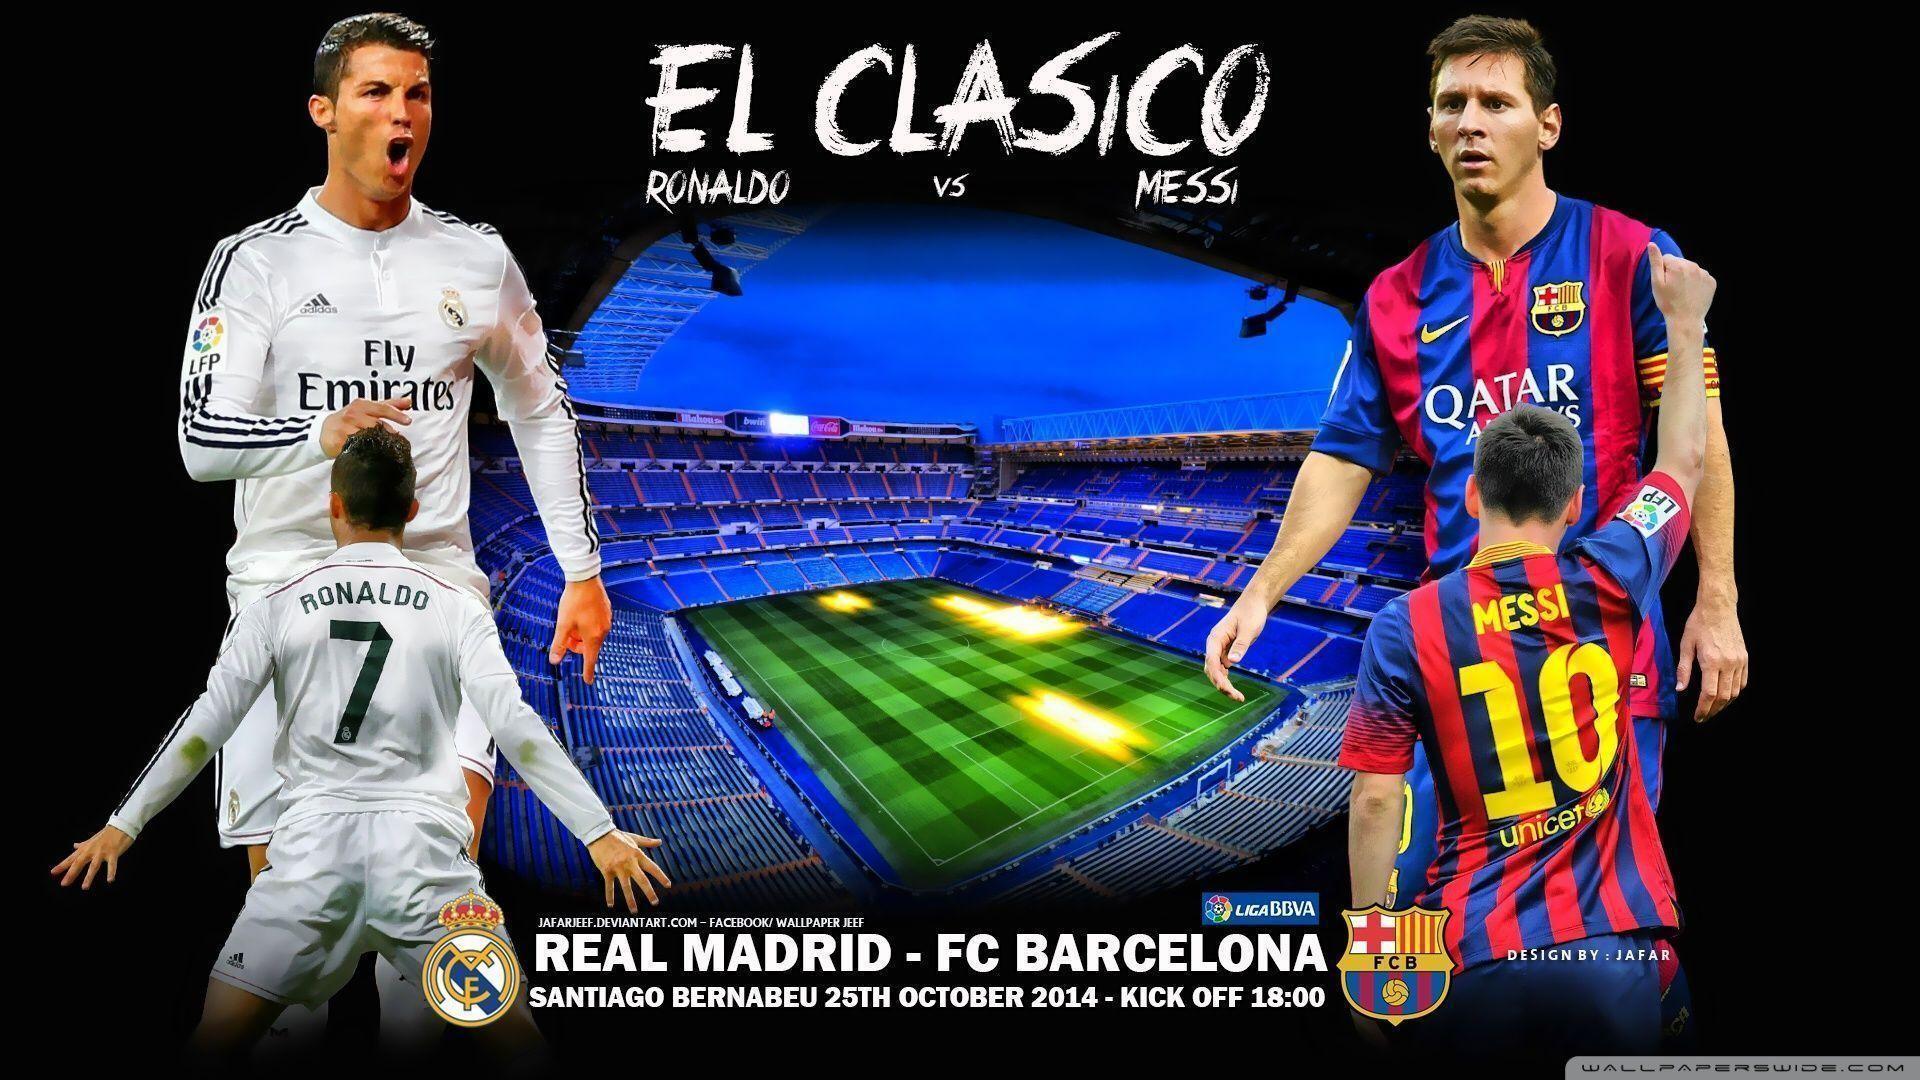 Ronaldo vs Messi Wallpaper 2018 77 images 1920x1080